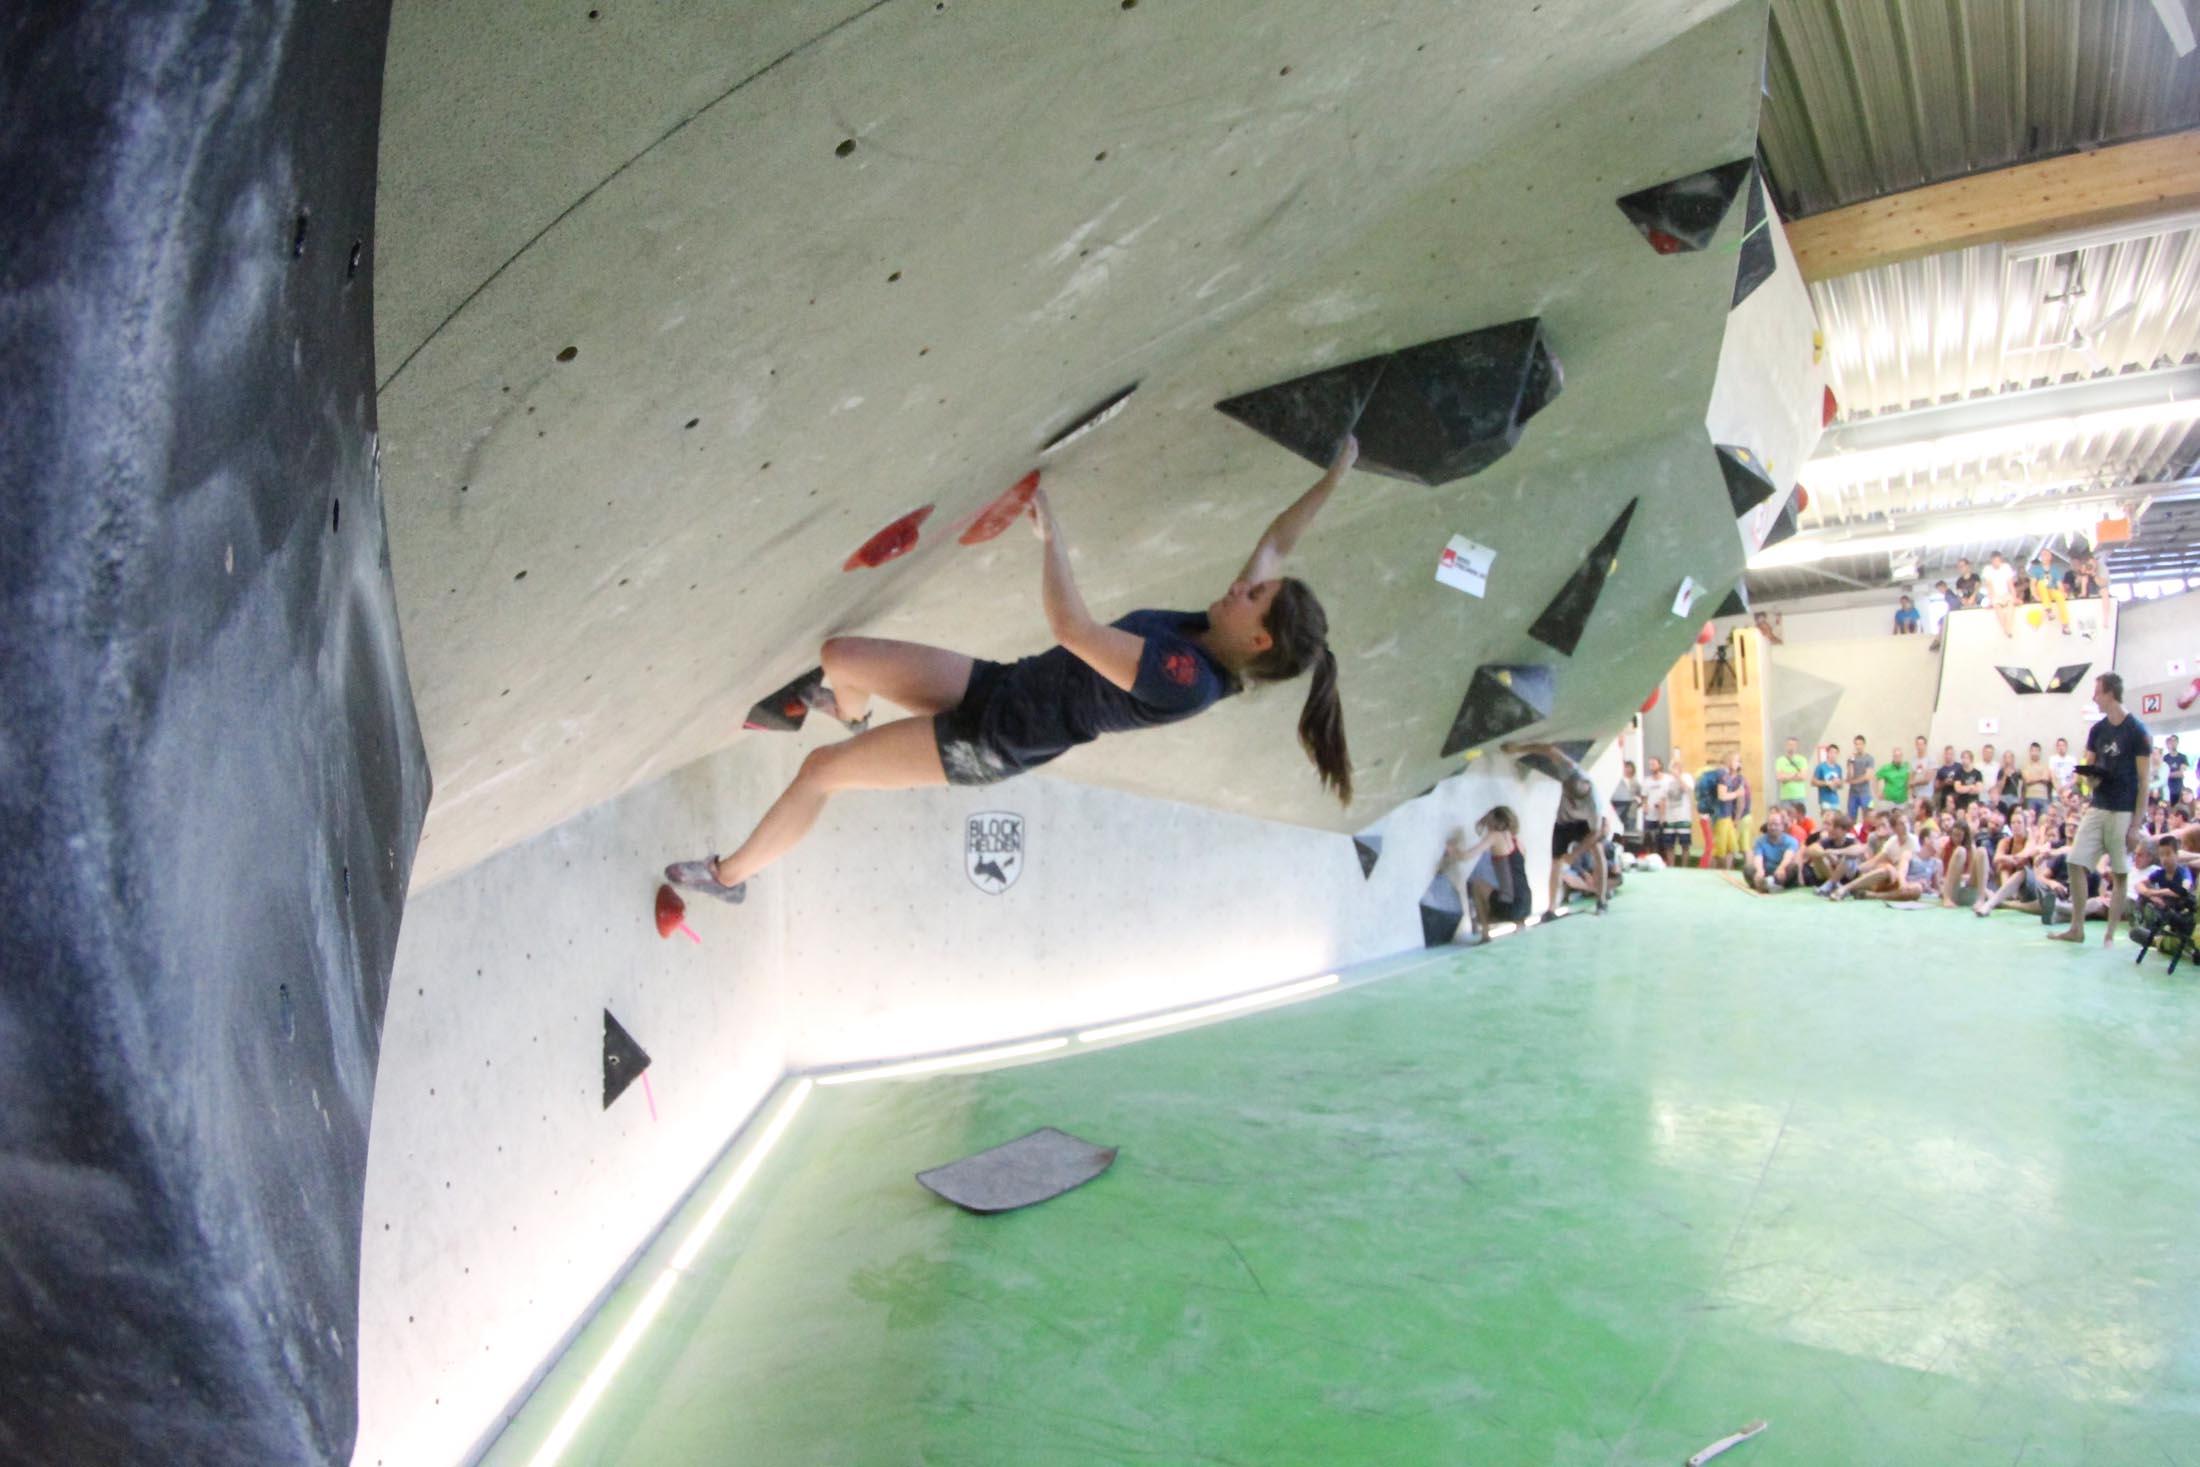 Finale, internationaler bouldercup Frankenjura 2016, BLOCKHELDEN Erlangen, Mammut, Bergfreunde.de, Boulderwettkampf07092016670